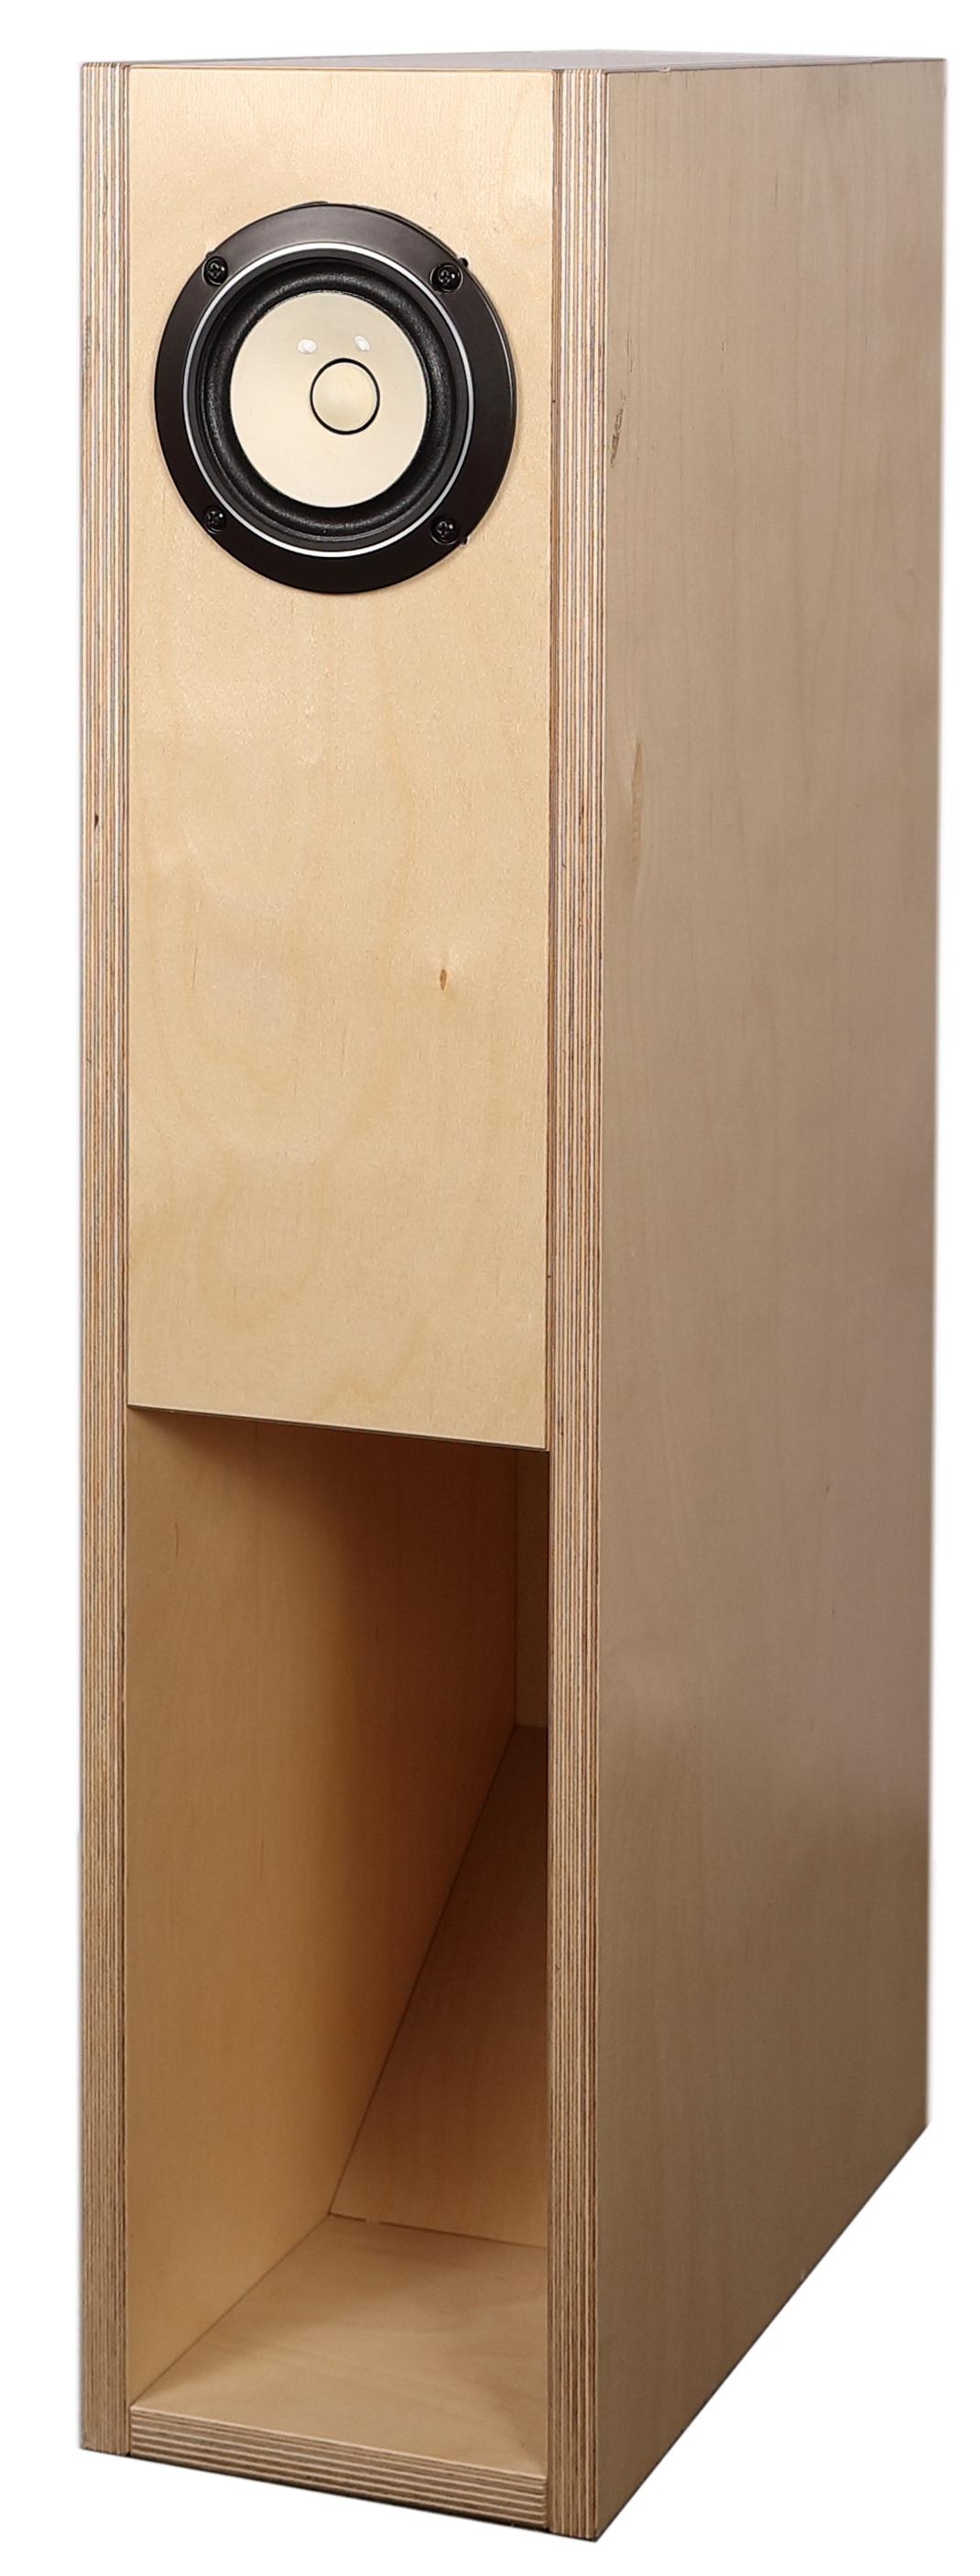 bk 12 m art of sound hornlautsprecher. Black Bedroom Furniture Sets. Home Design Ideas